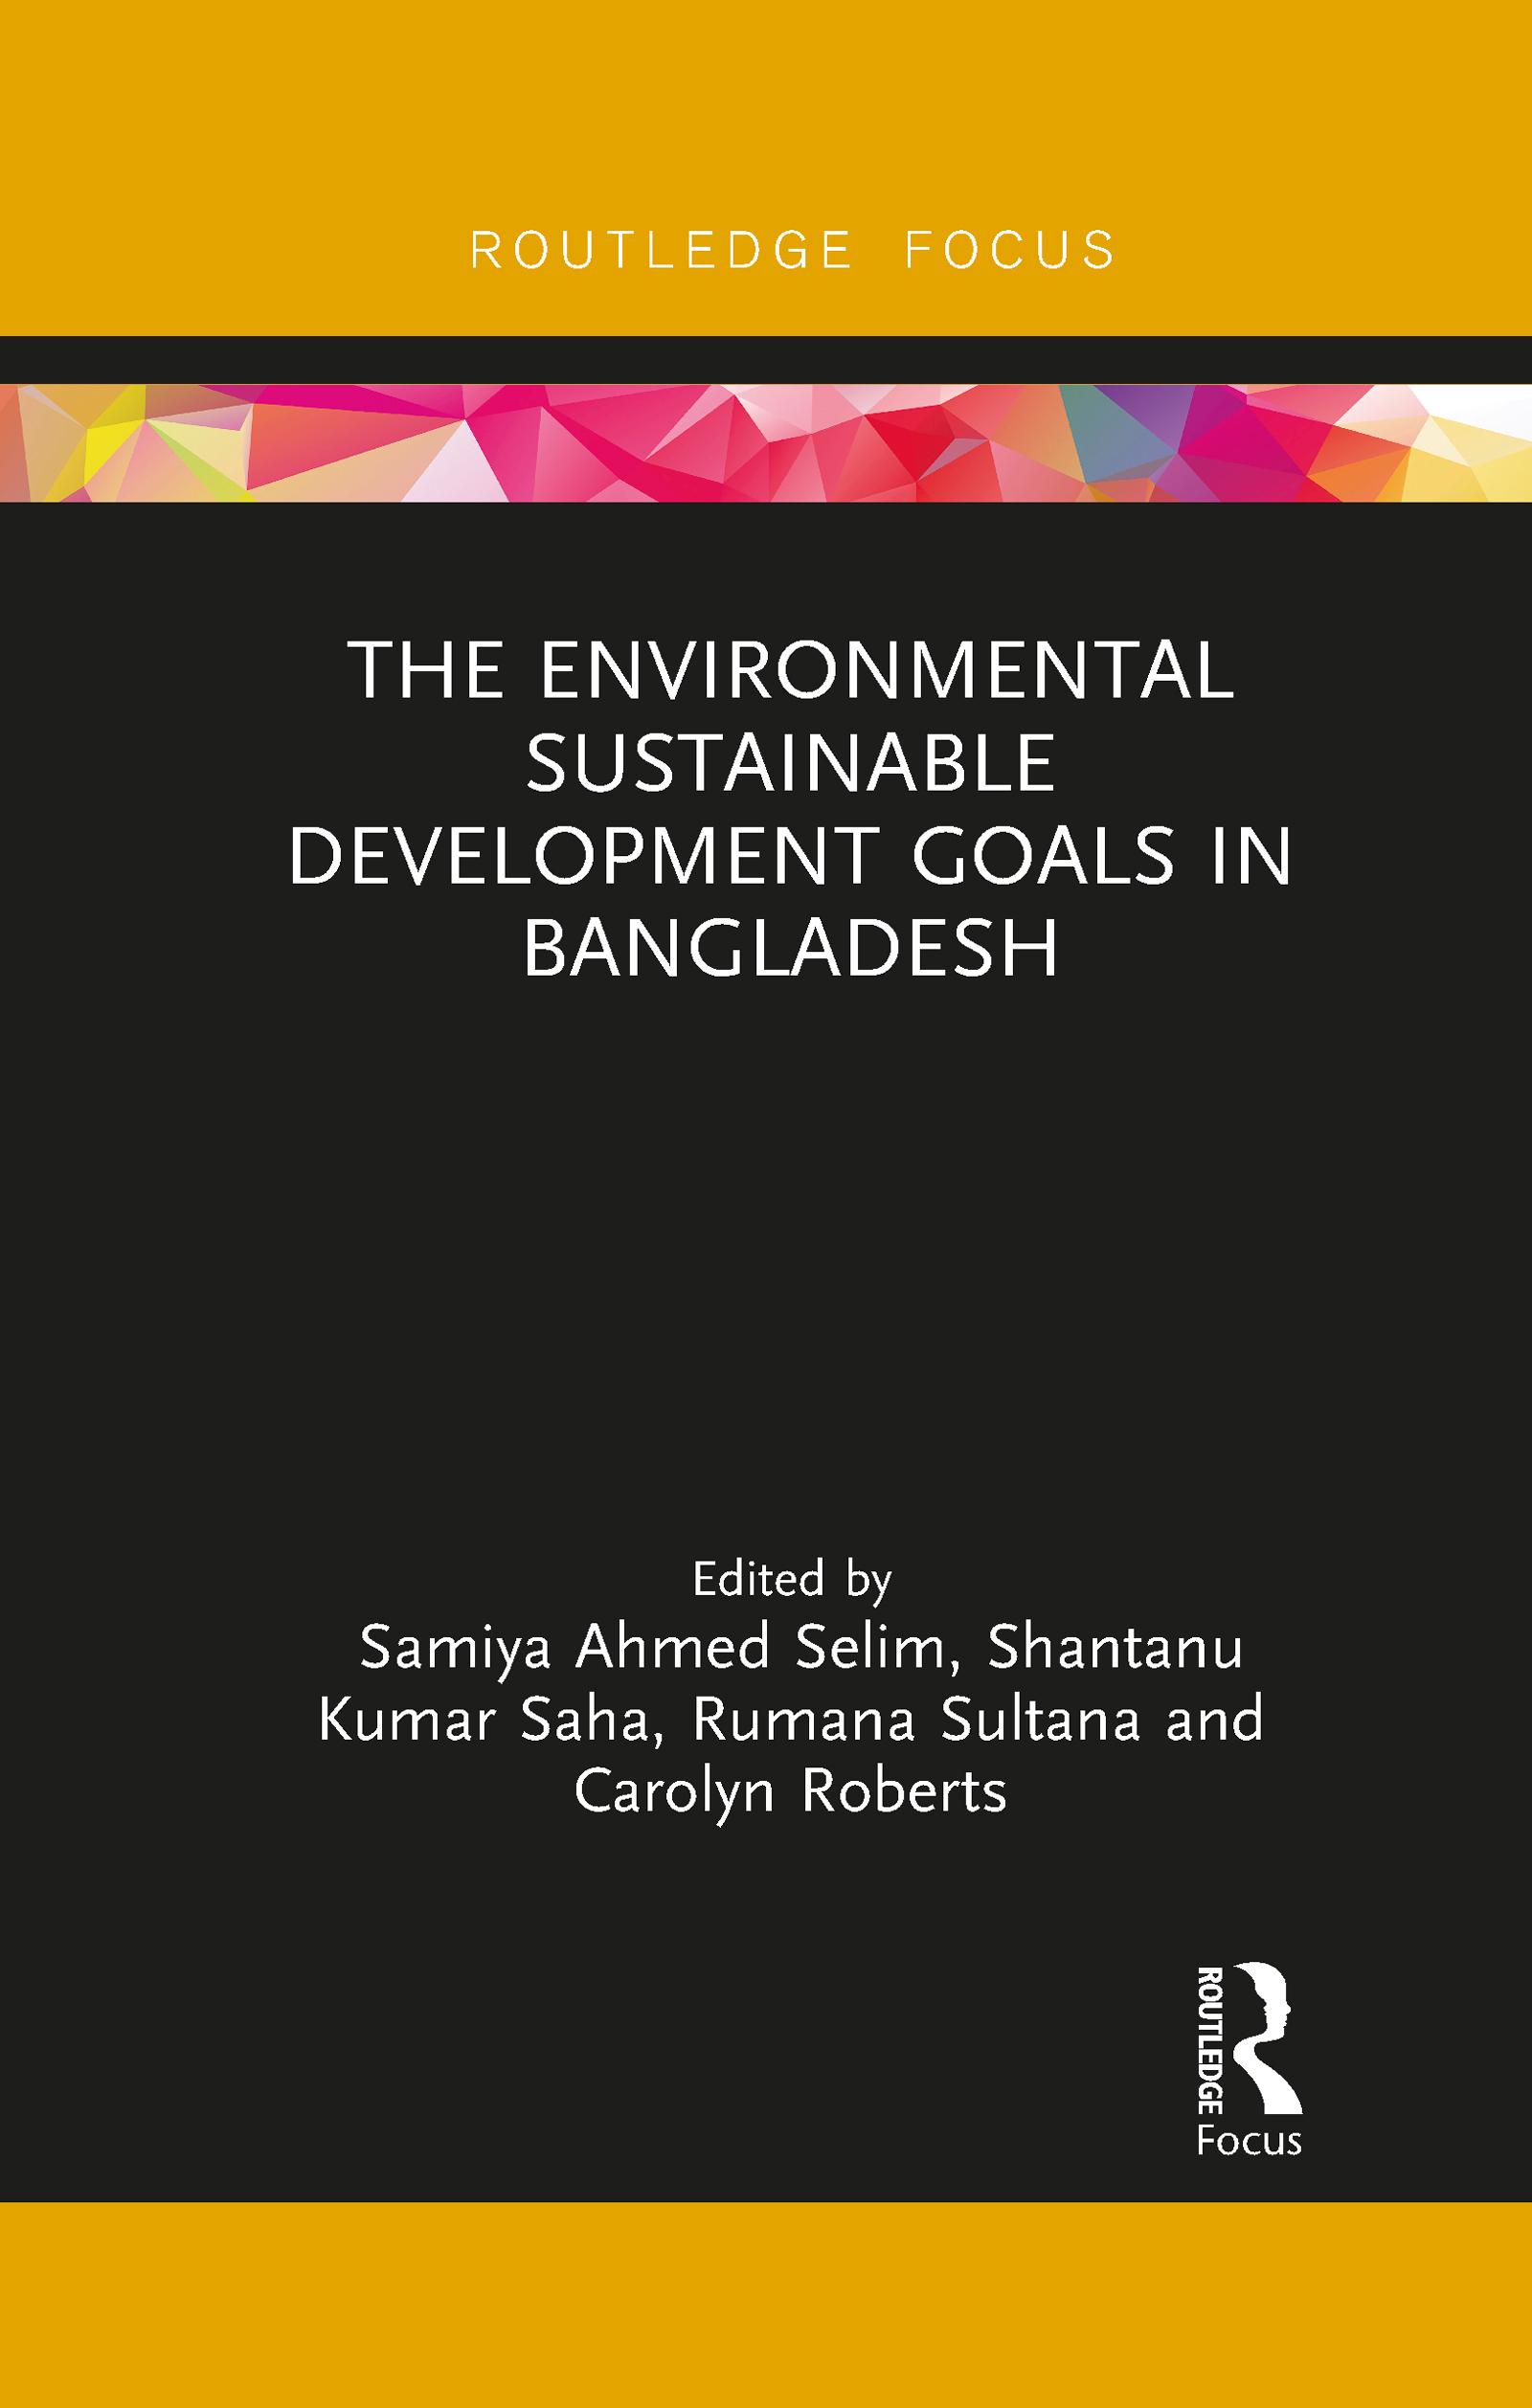 The Environmental Sustainable Development Goals in Bangladesh